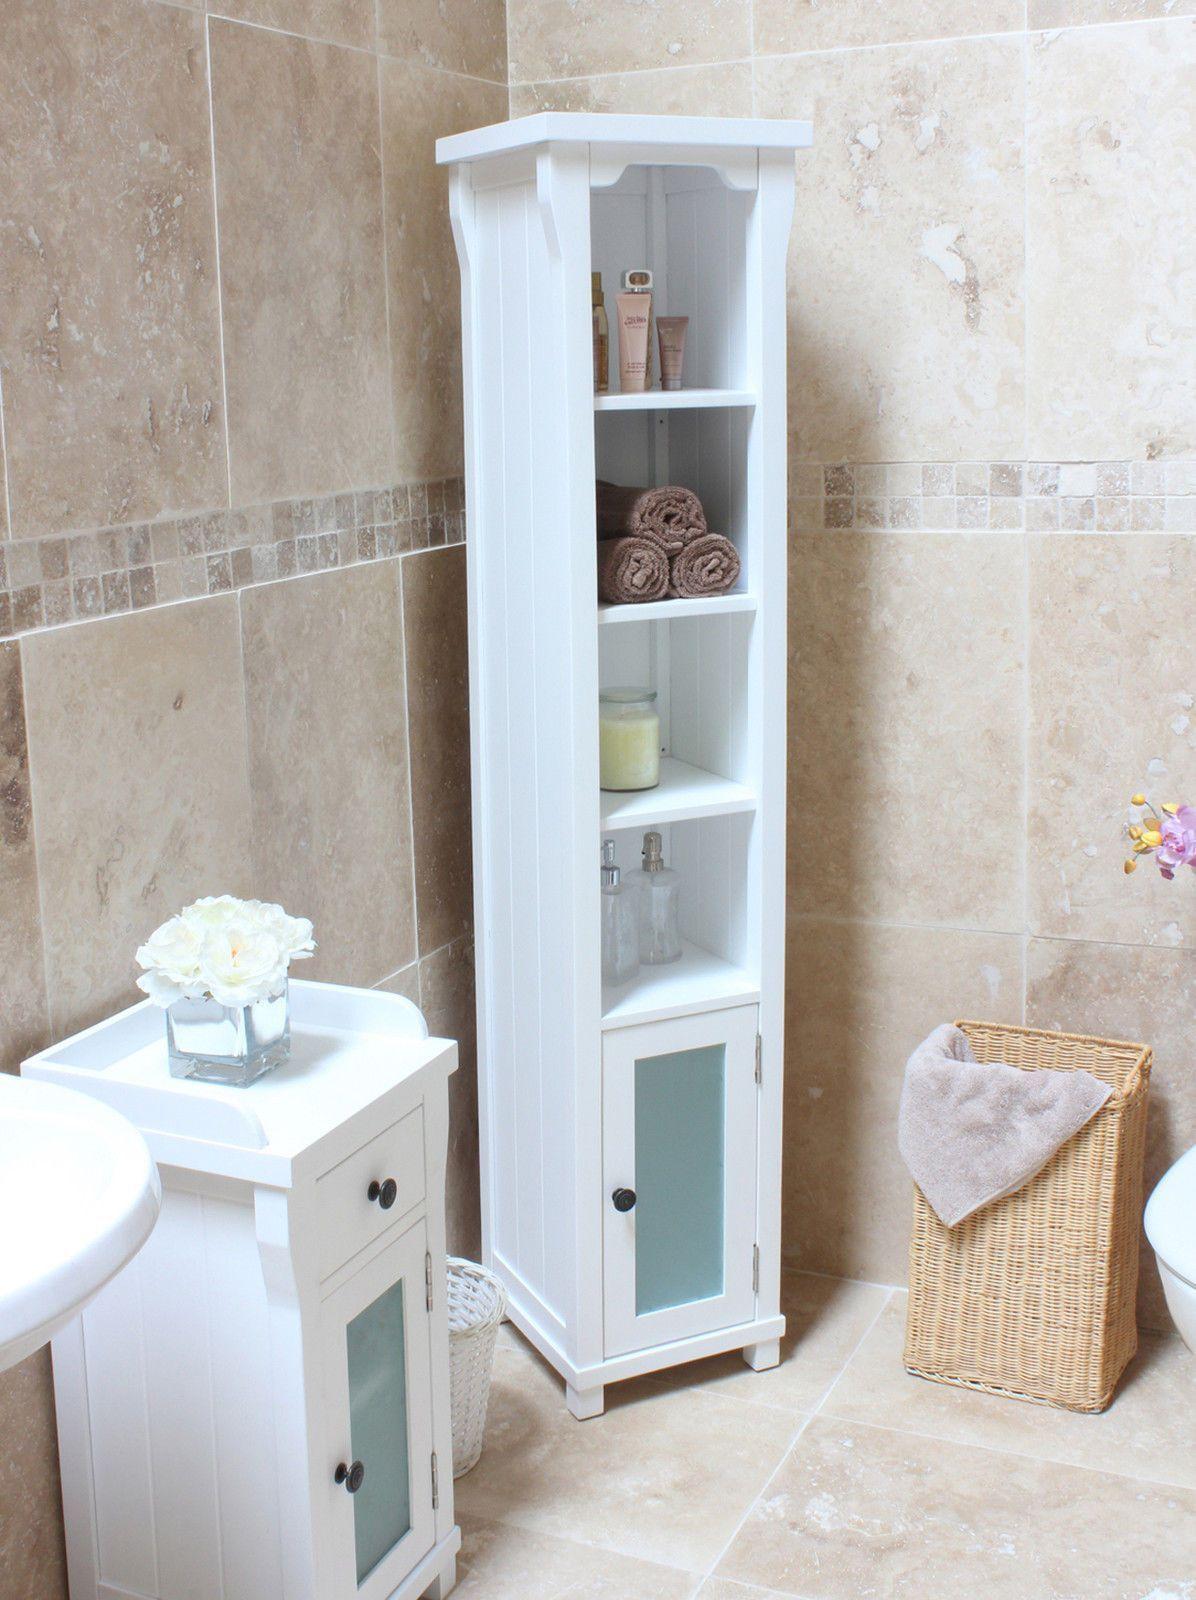 Smart Vertical Bathroom Storage Tips For Maximum Space Utilization Bathroom Shelving Unit Bathroom Units Bathroom Storage